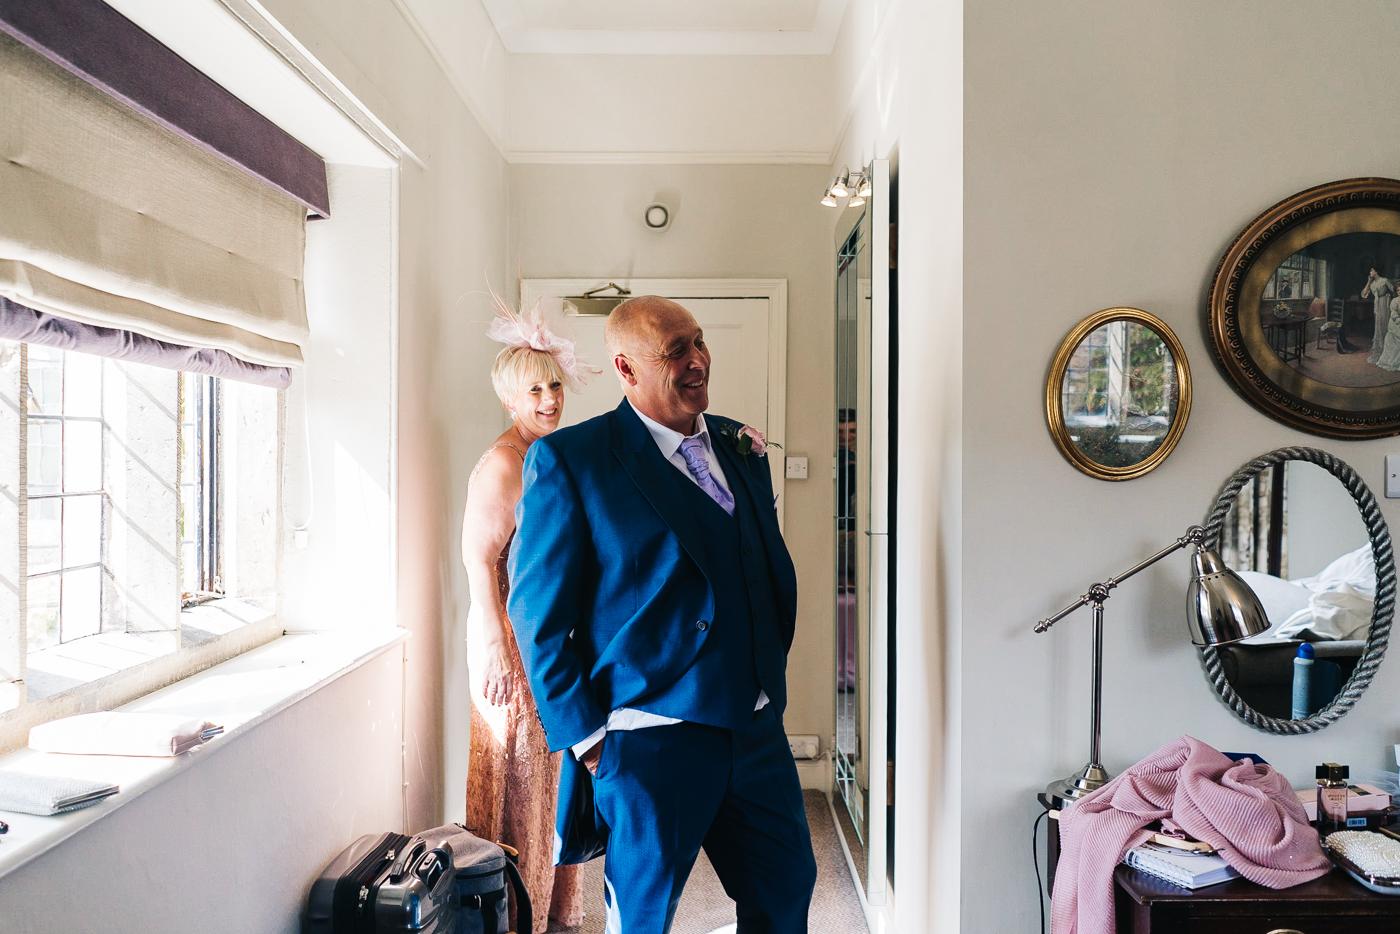 headlame-hall-north-yorkshire-north-east-photographer-wedding-0017.jpg